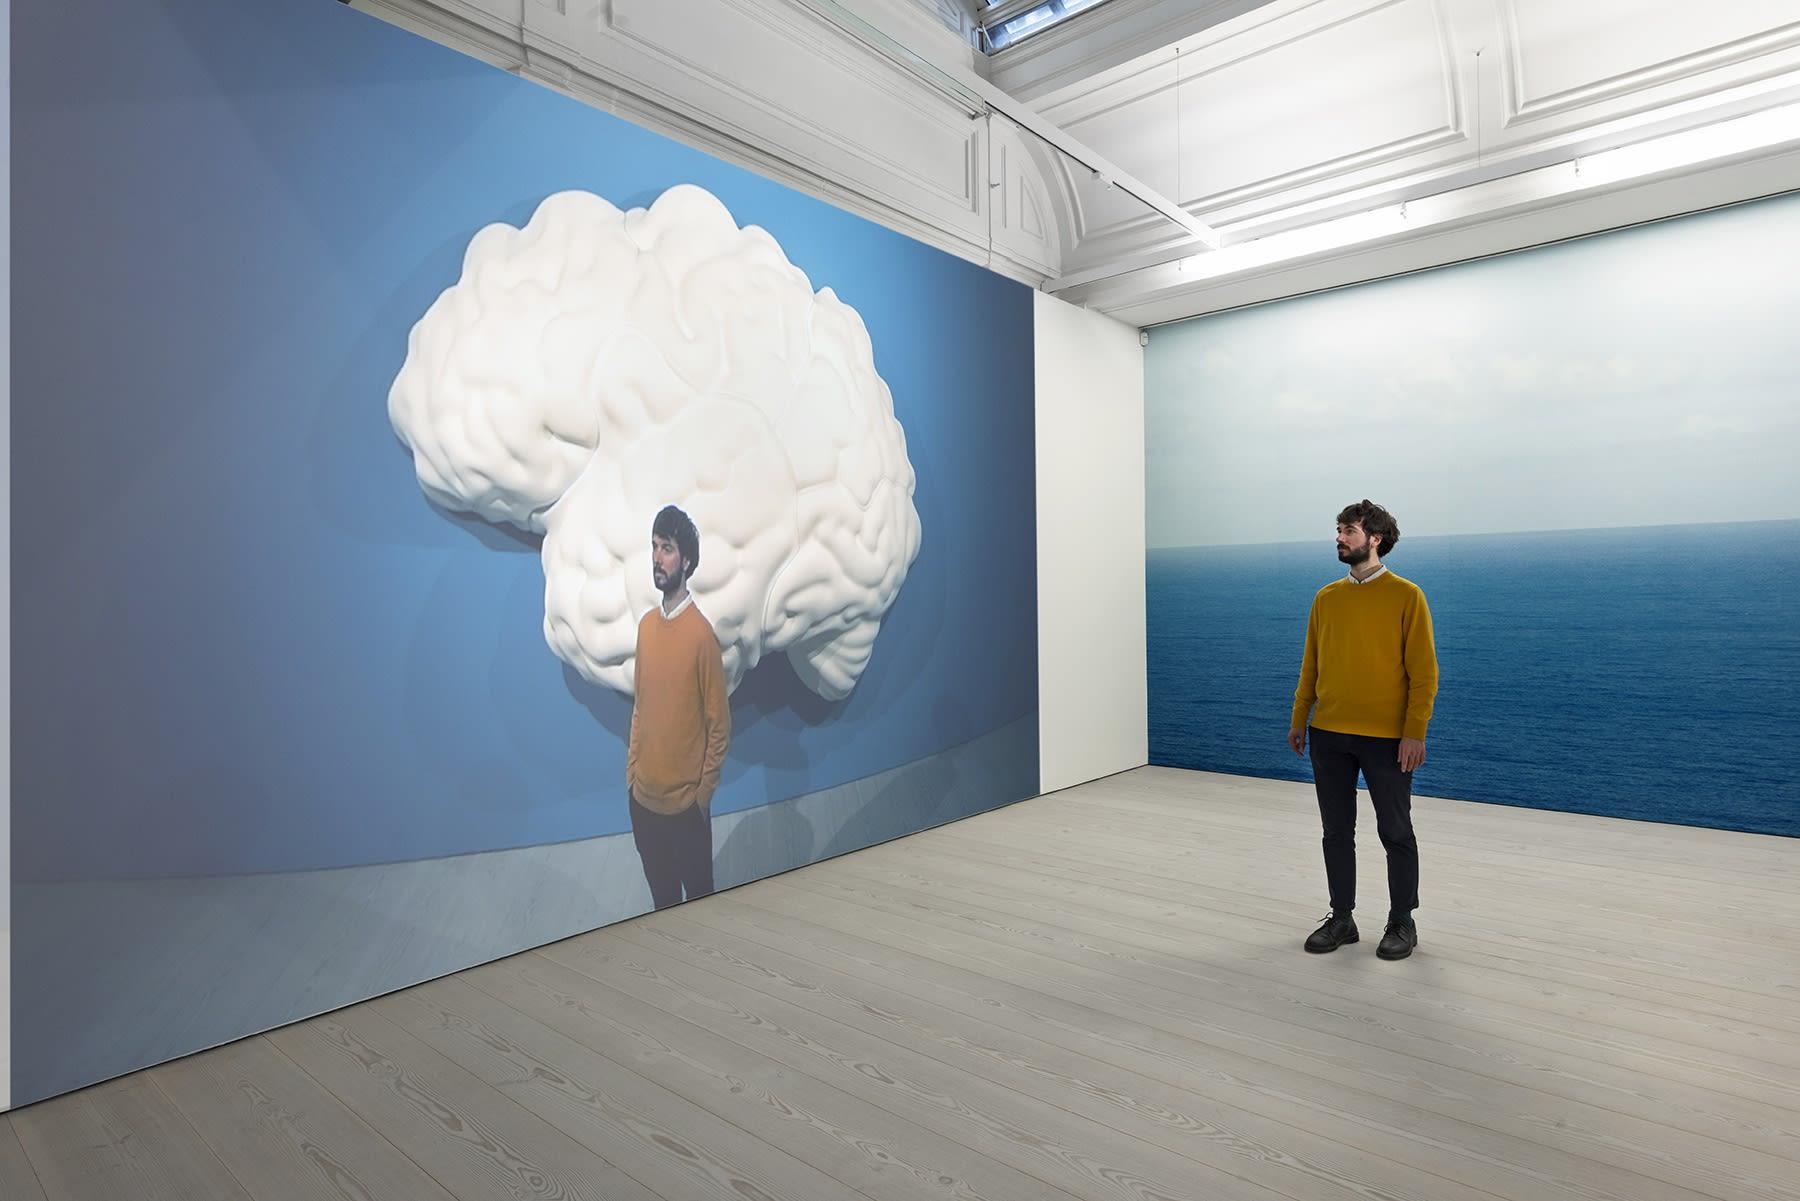 John Baldessari Brain/Cloud (Two Views)